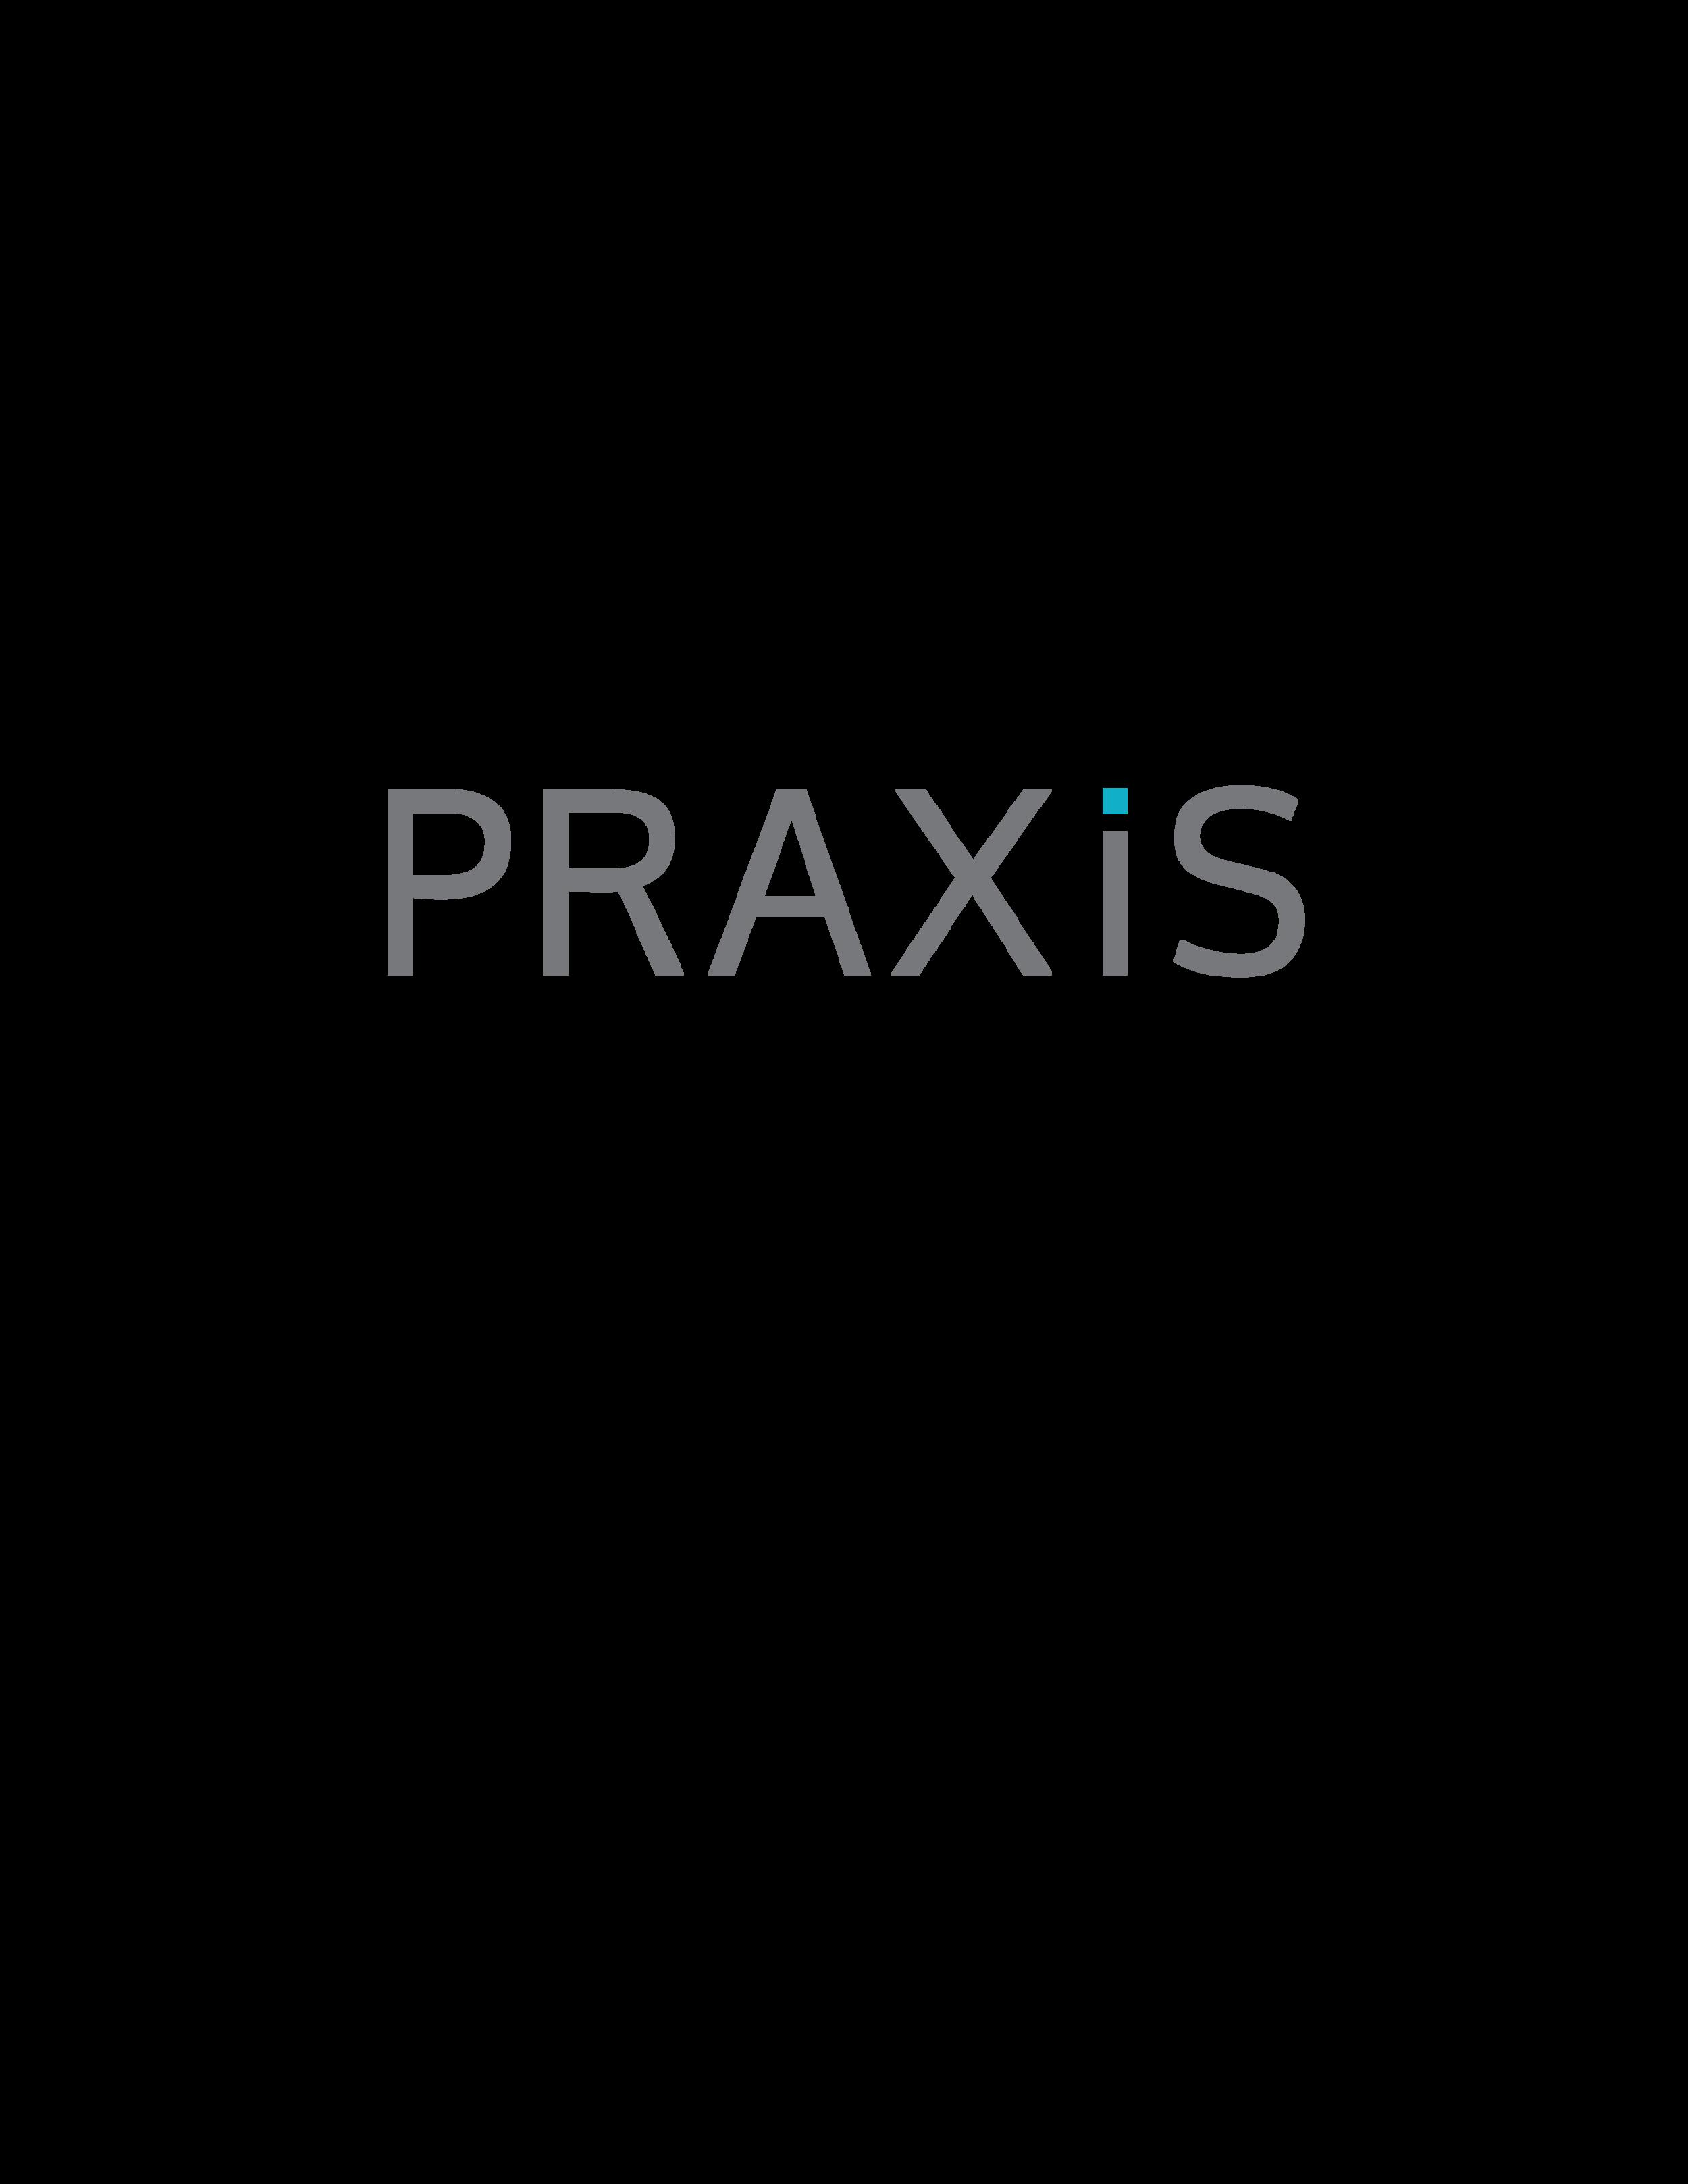 Praxis-01.png